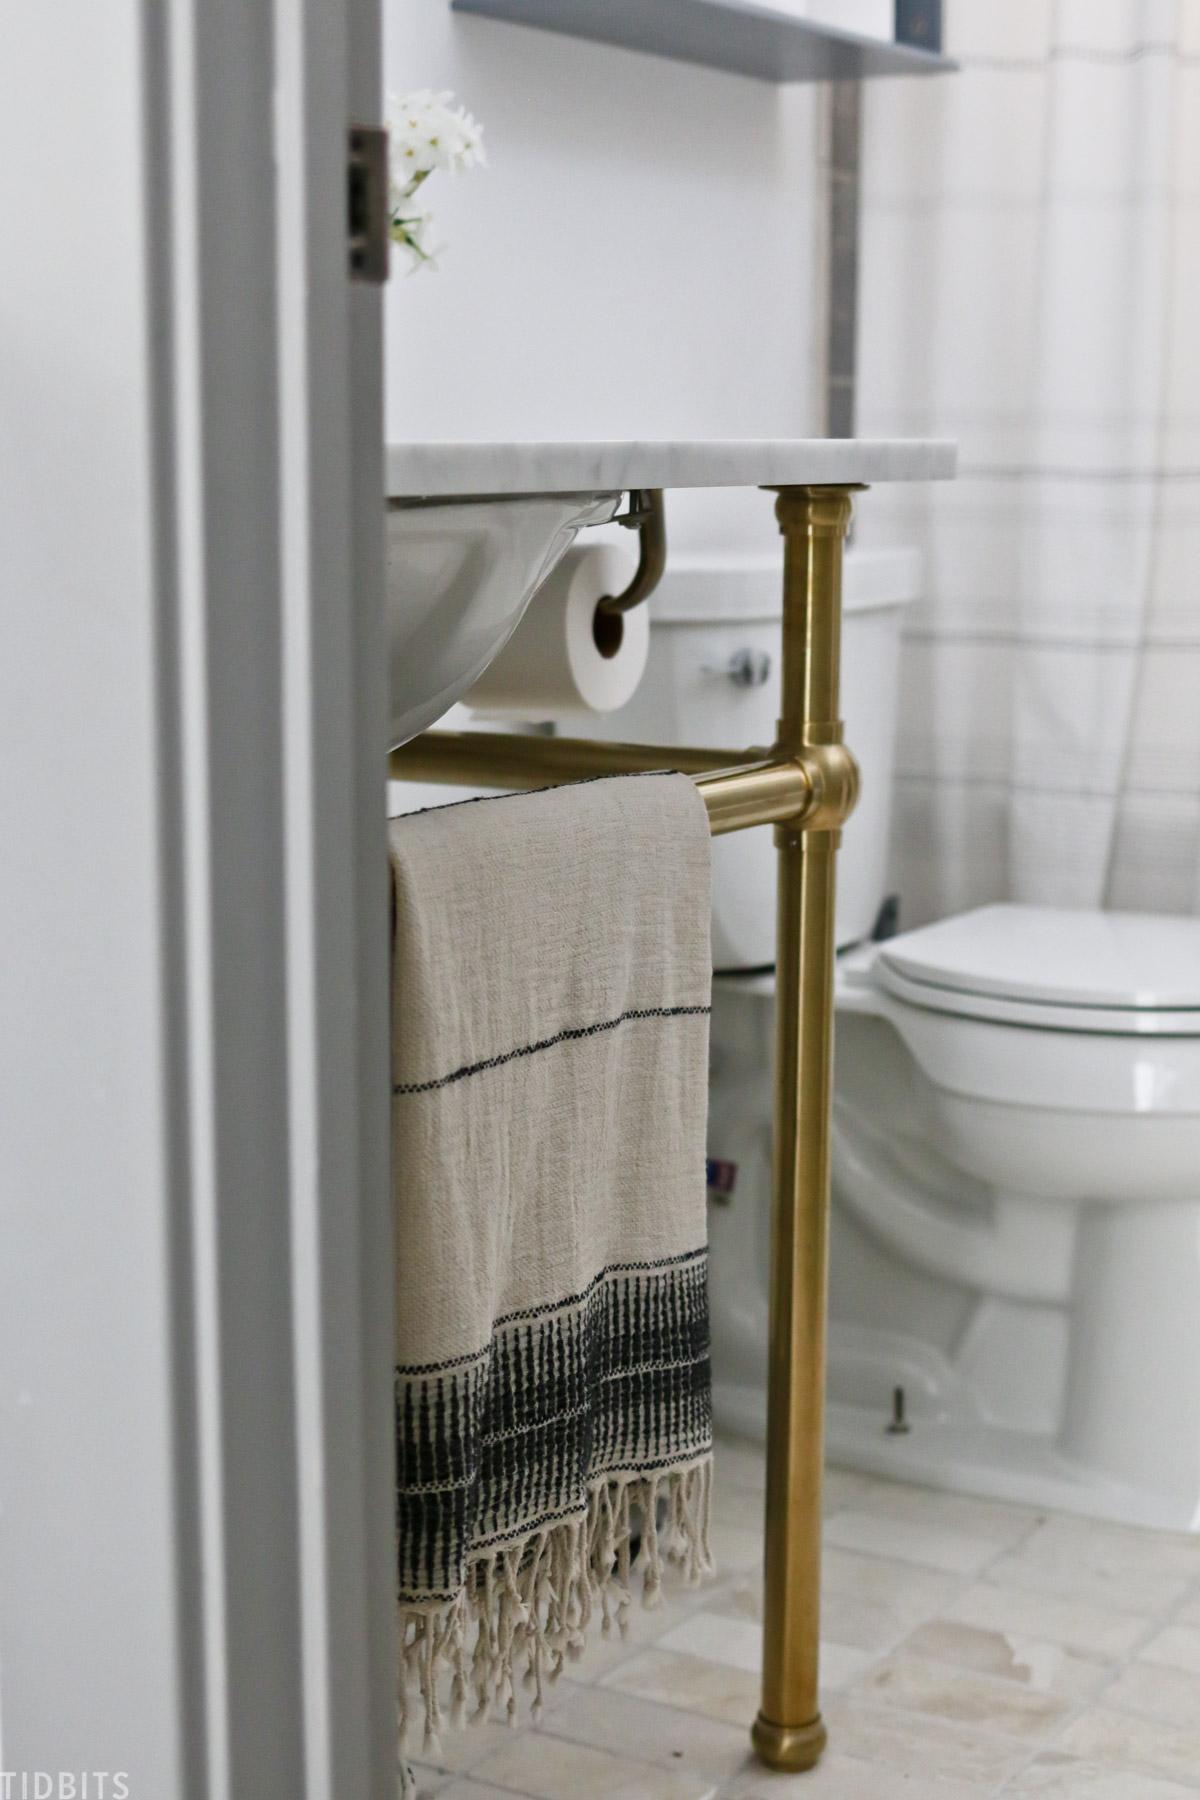 towel hung underneath exposed bathroom sink next to toilet